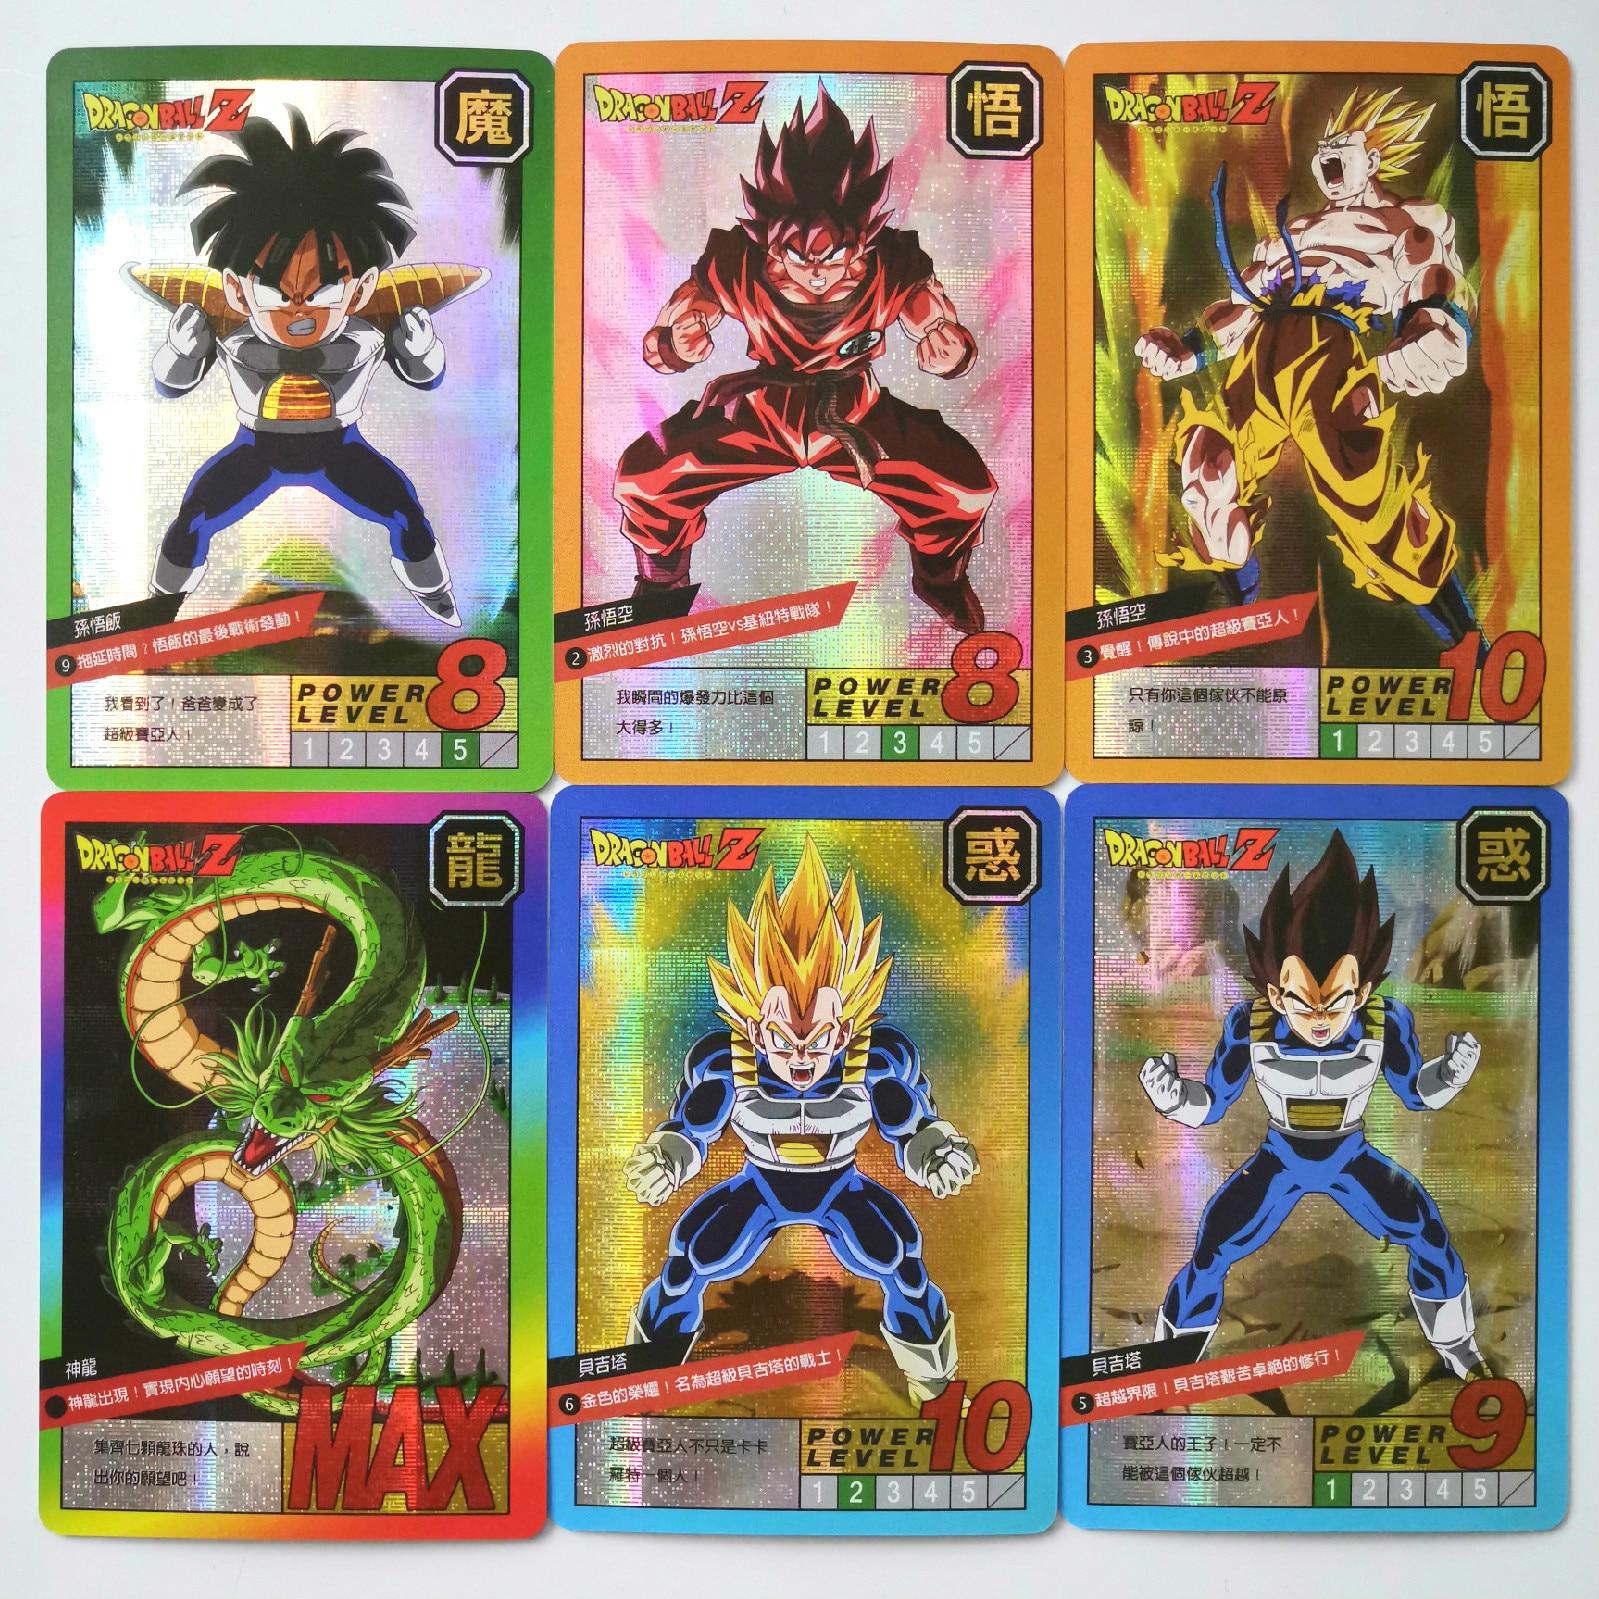 55pcs/set Dragon Ball Super Ultra Instinct Goku Jiren Commemorative Edition Game Flash Card Collection Anime Cards